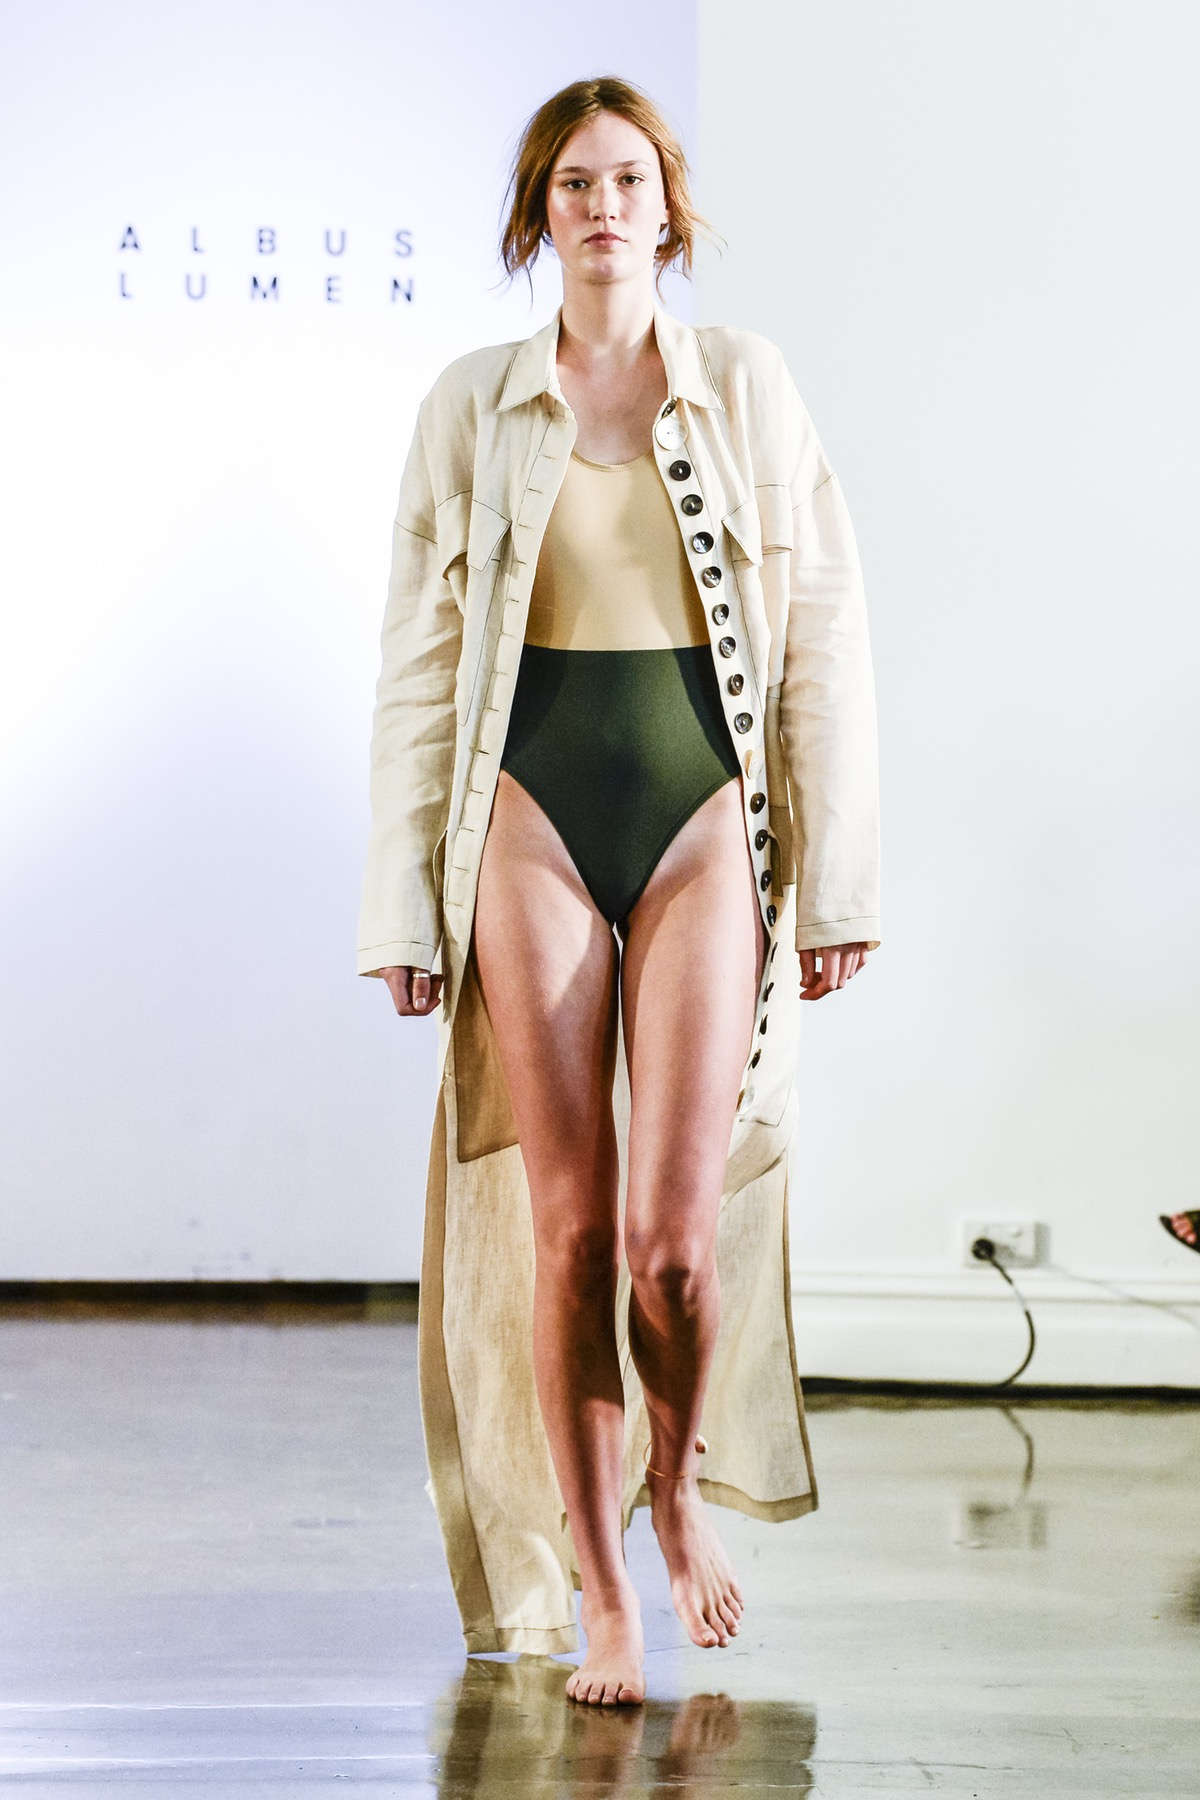 Albus Lumen Resort 2018, image via The Business Of Fashion